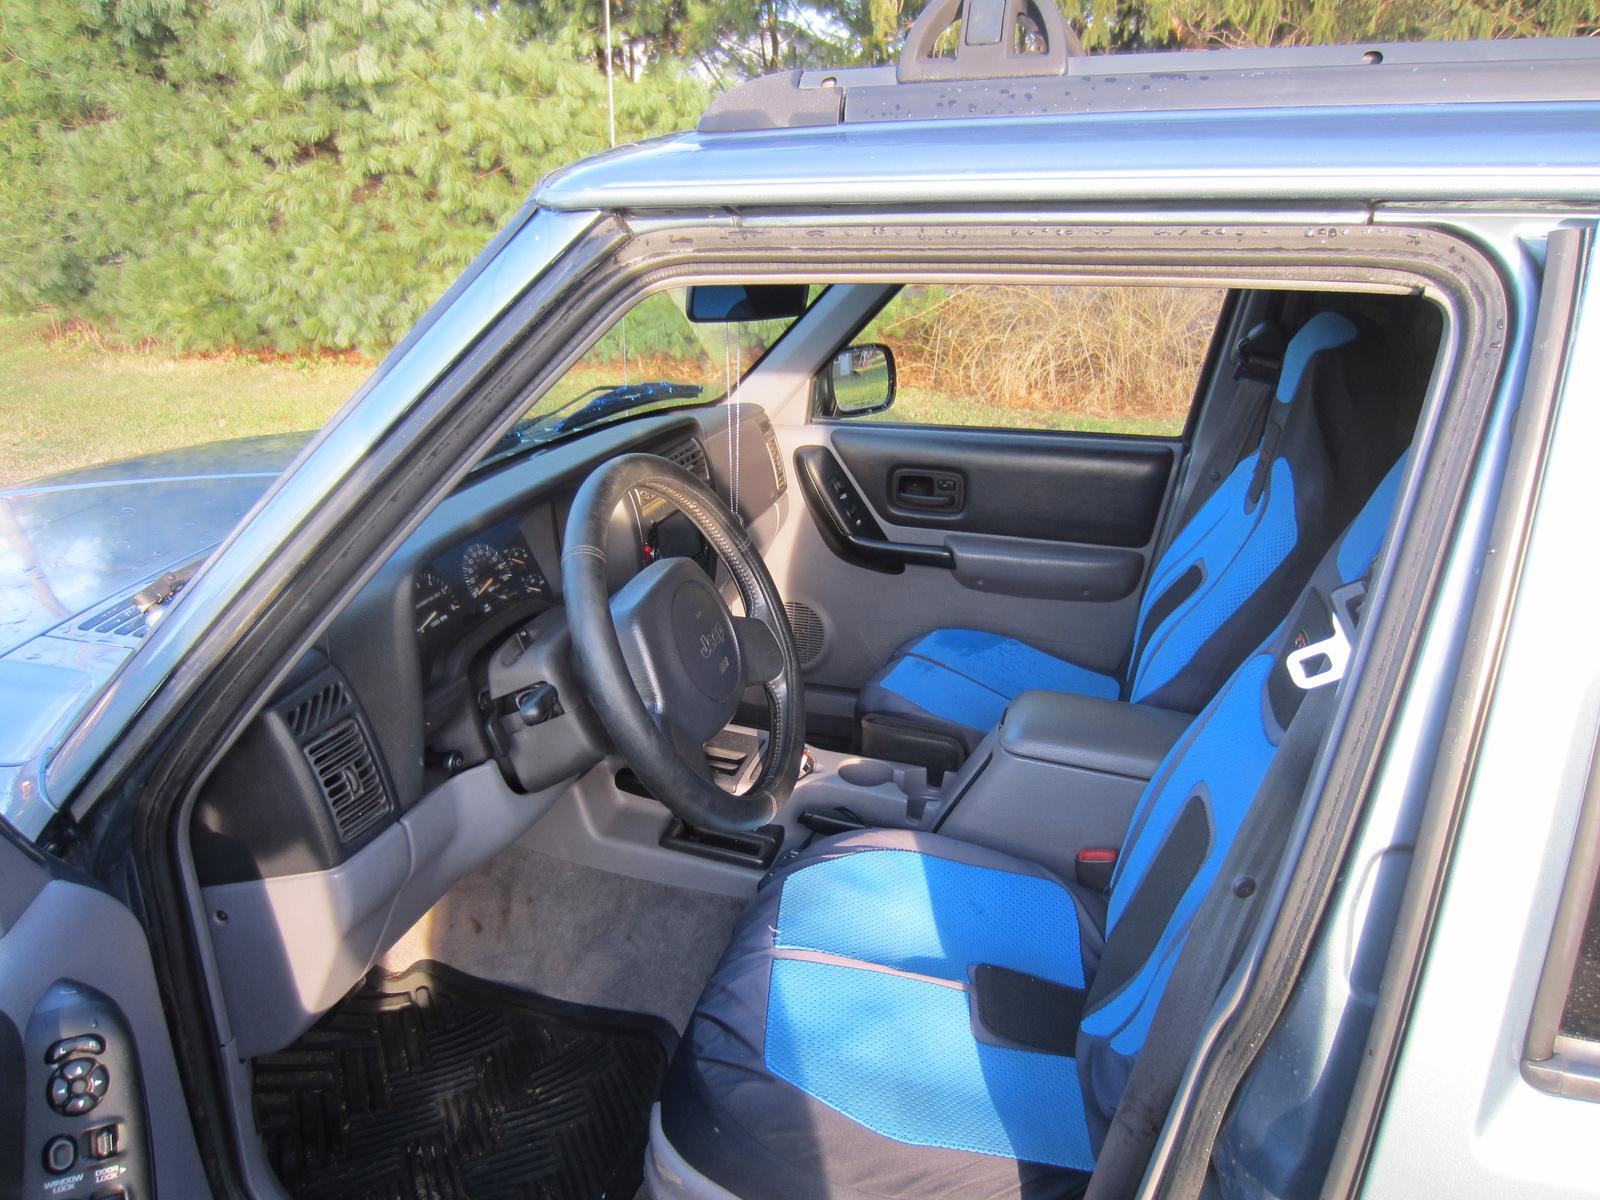 1997 Jeep Cherokee Interior Pictures Cargurus